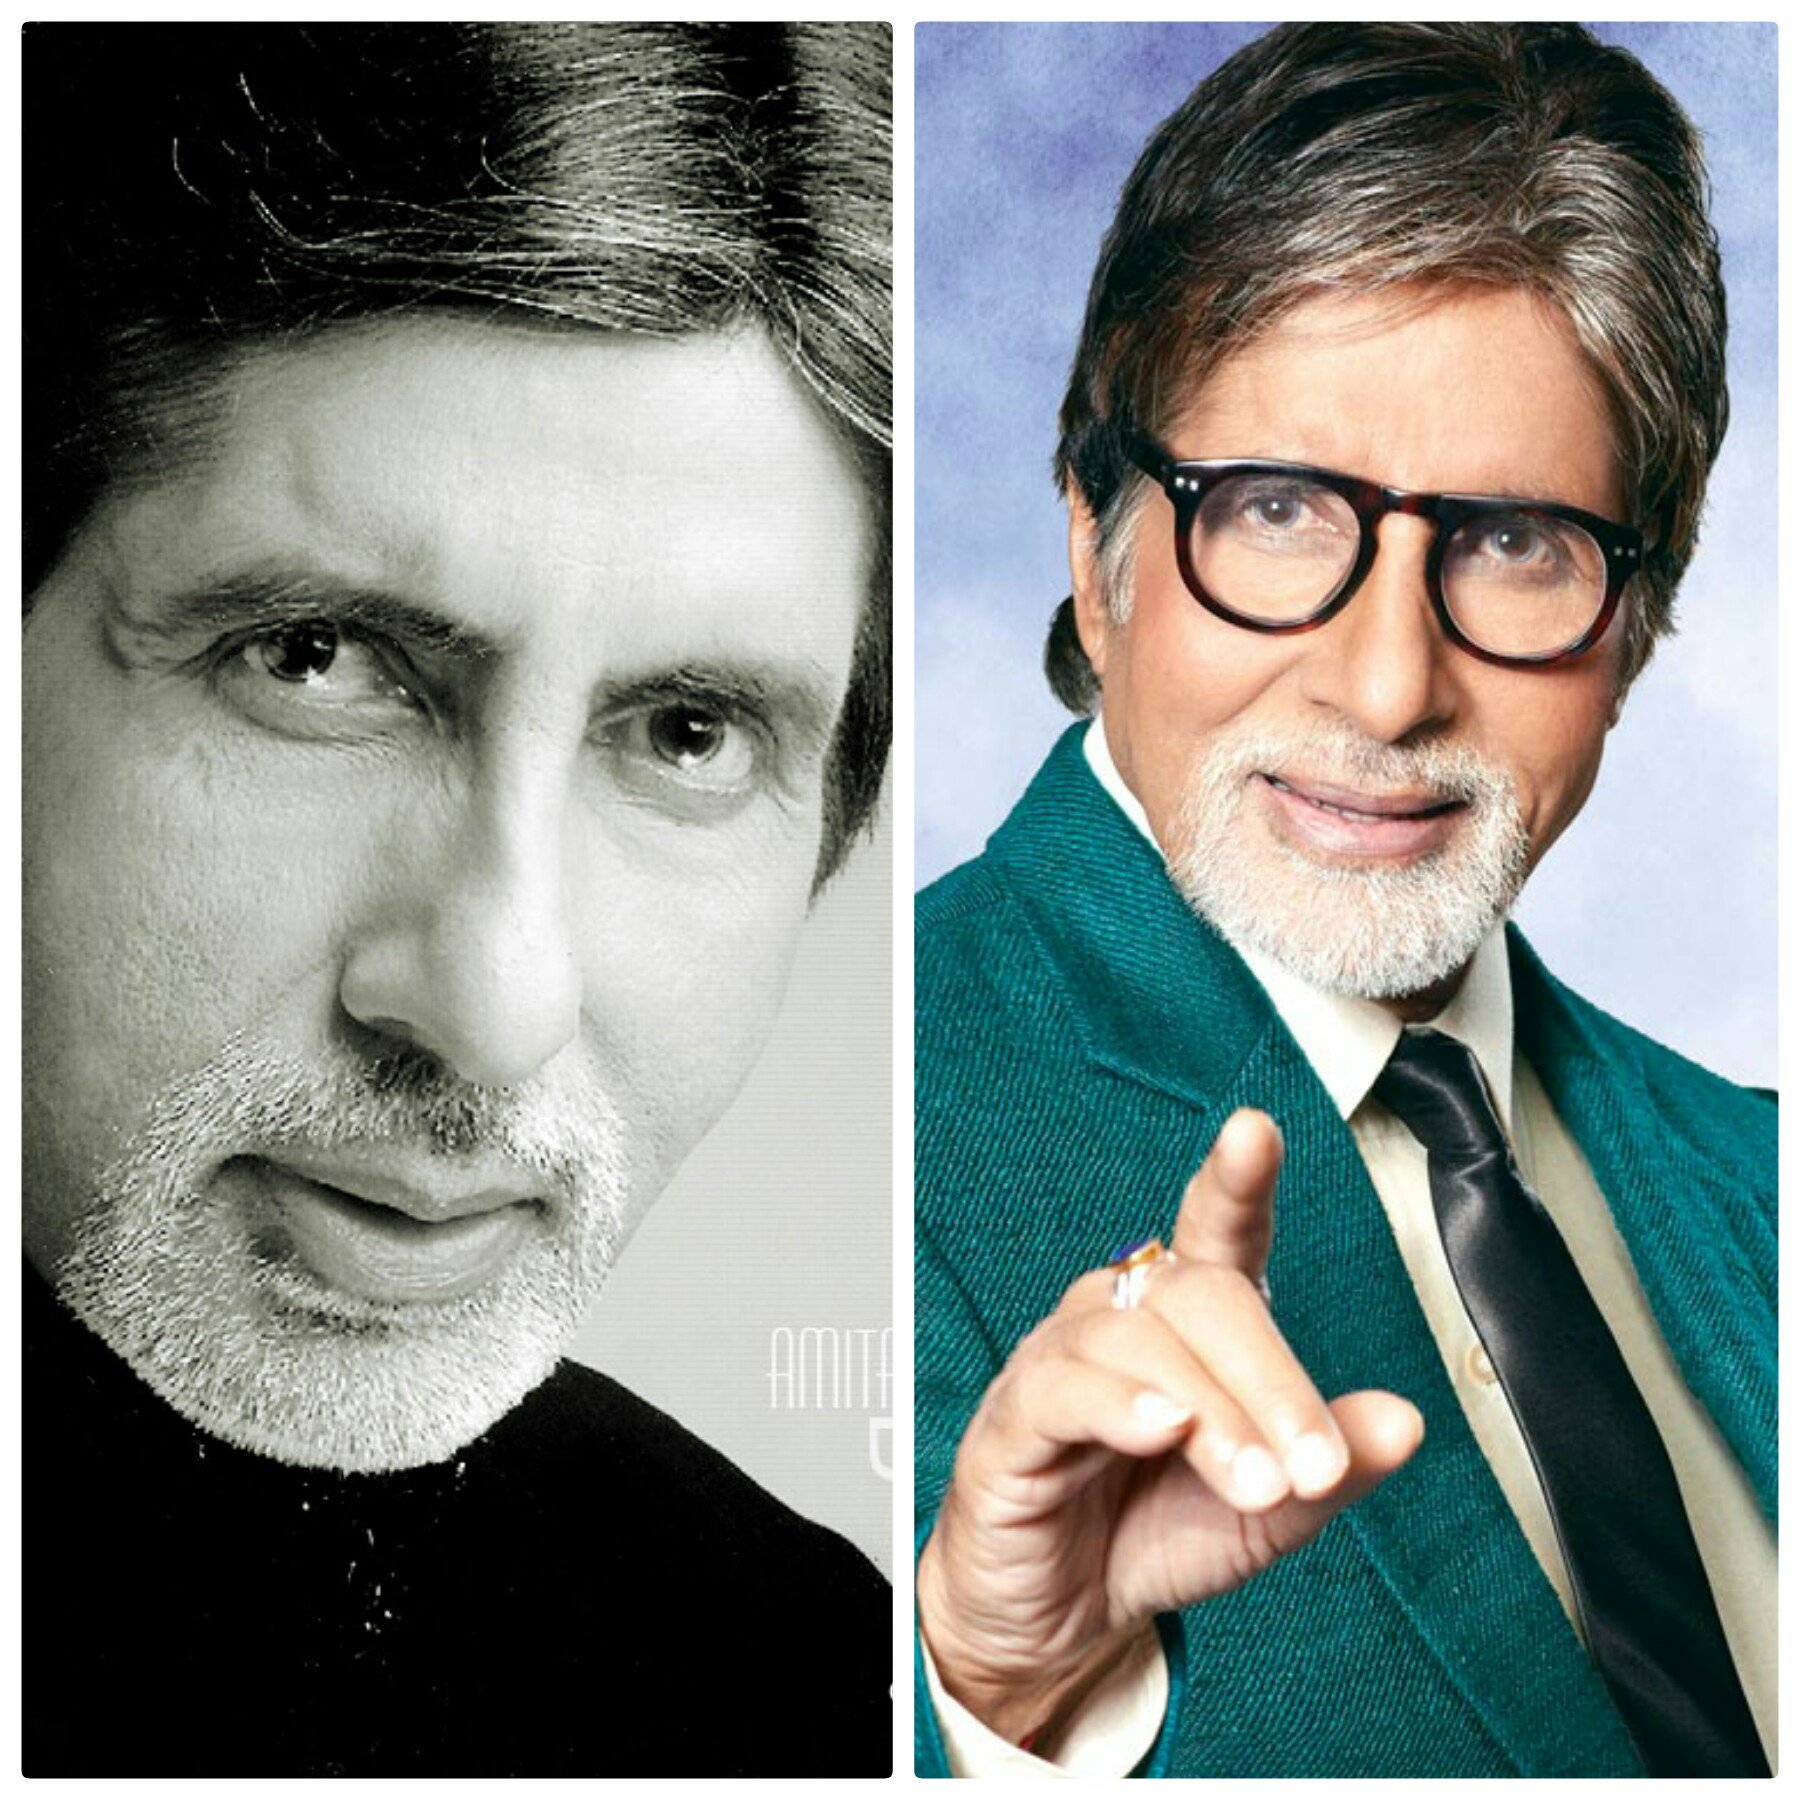 TODEY my favourite actor Amitabh Bachchan birthday I am very happy I wish you a very very happy birthday sir ji